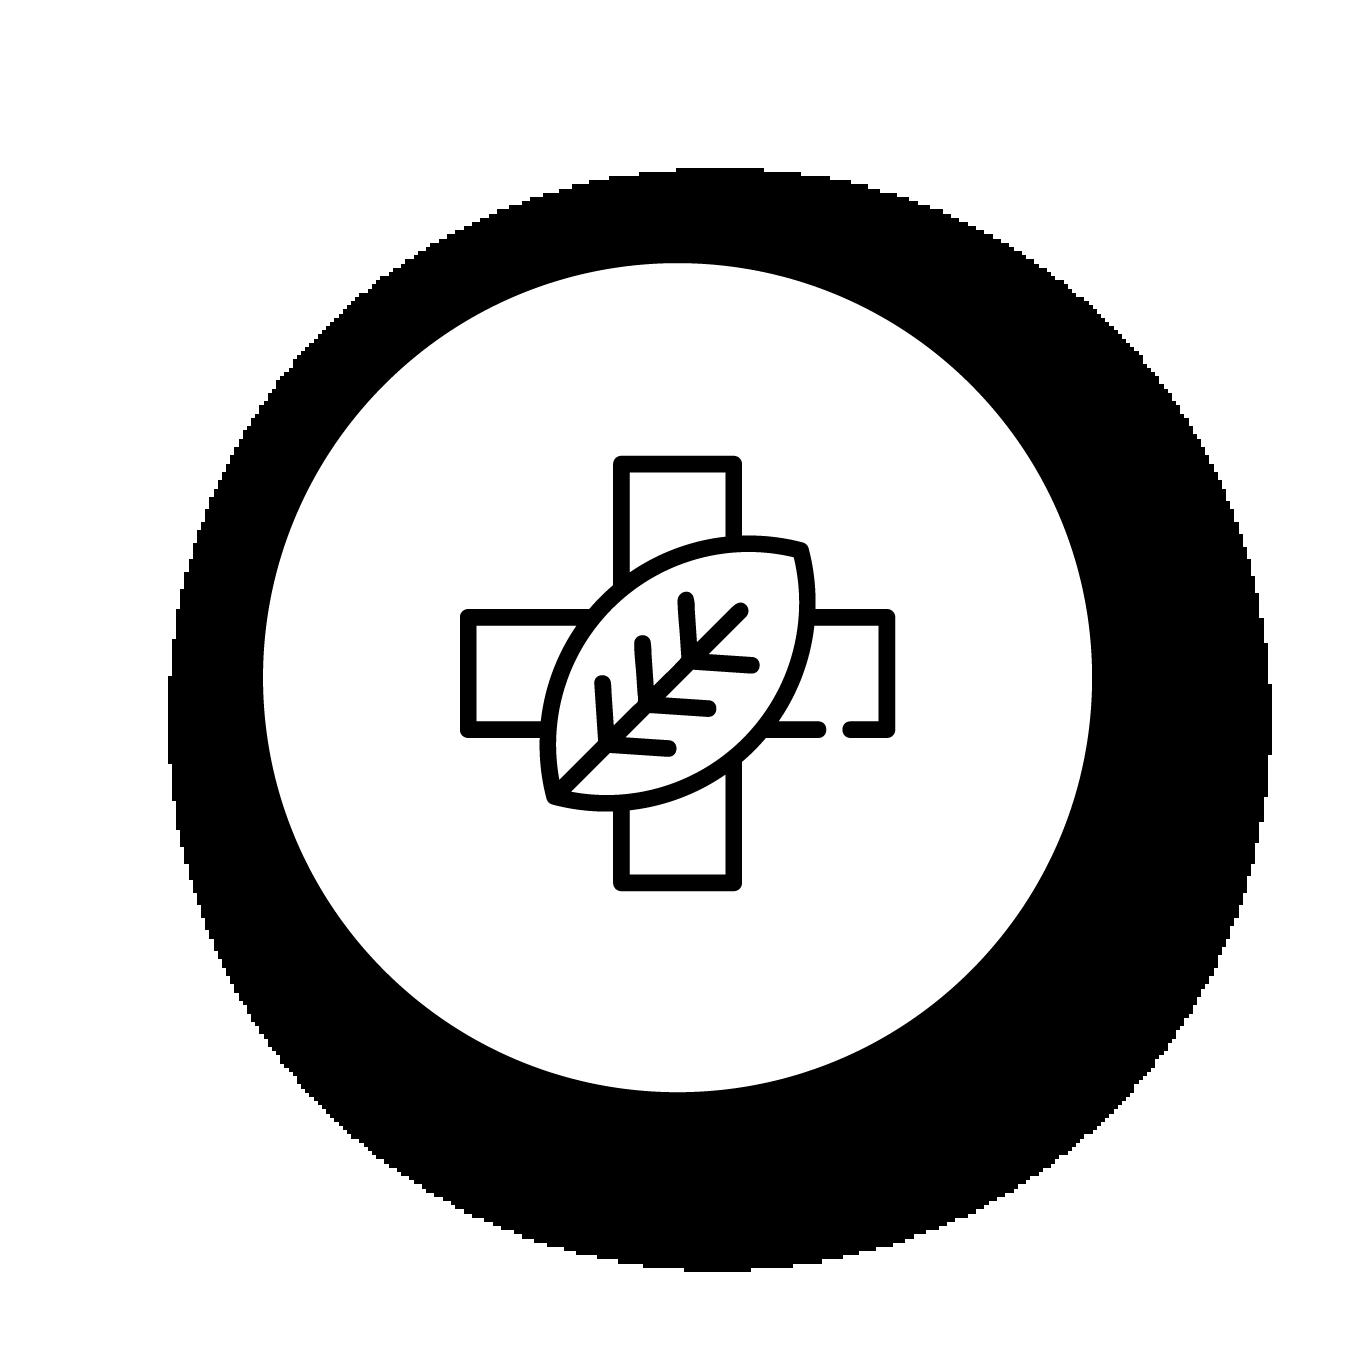 pictos-services-soins-energetiques